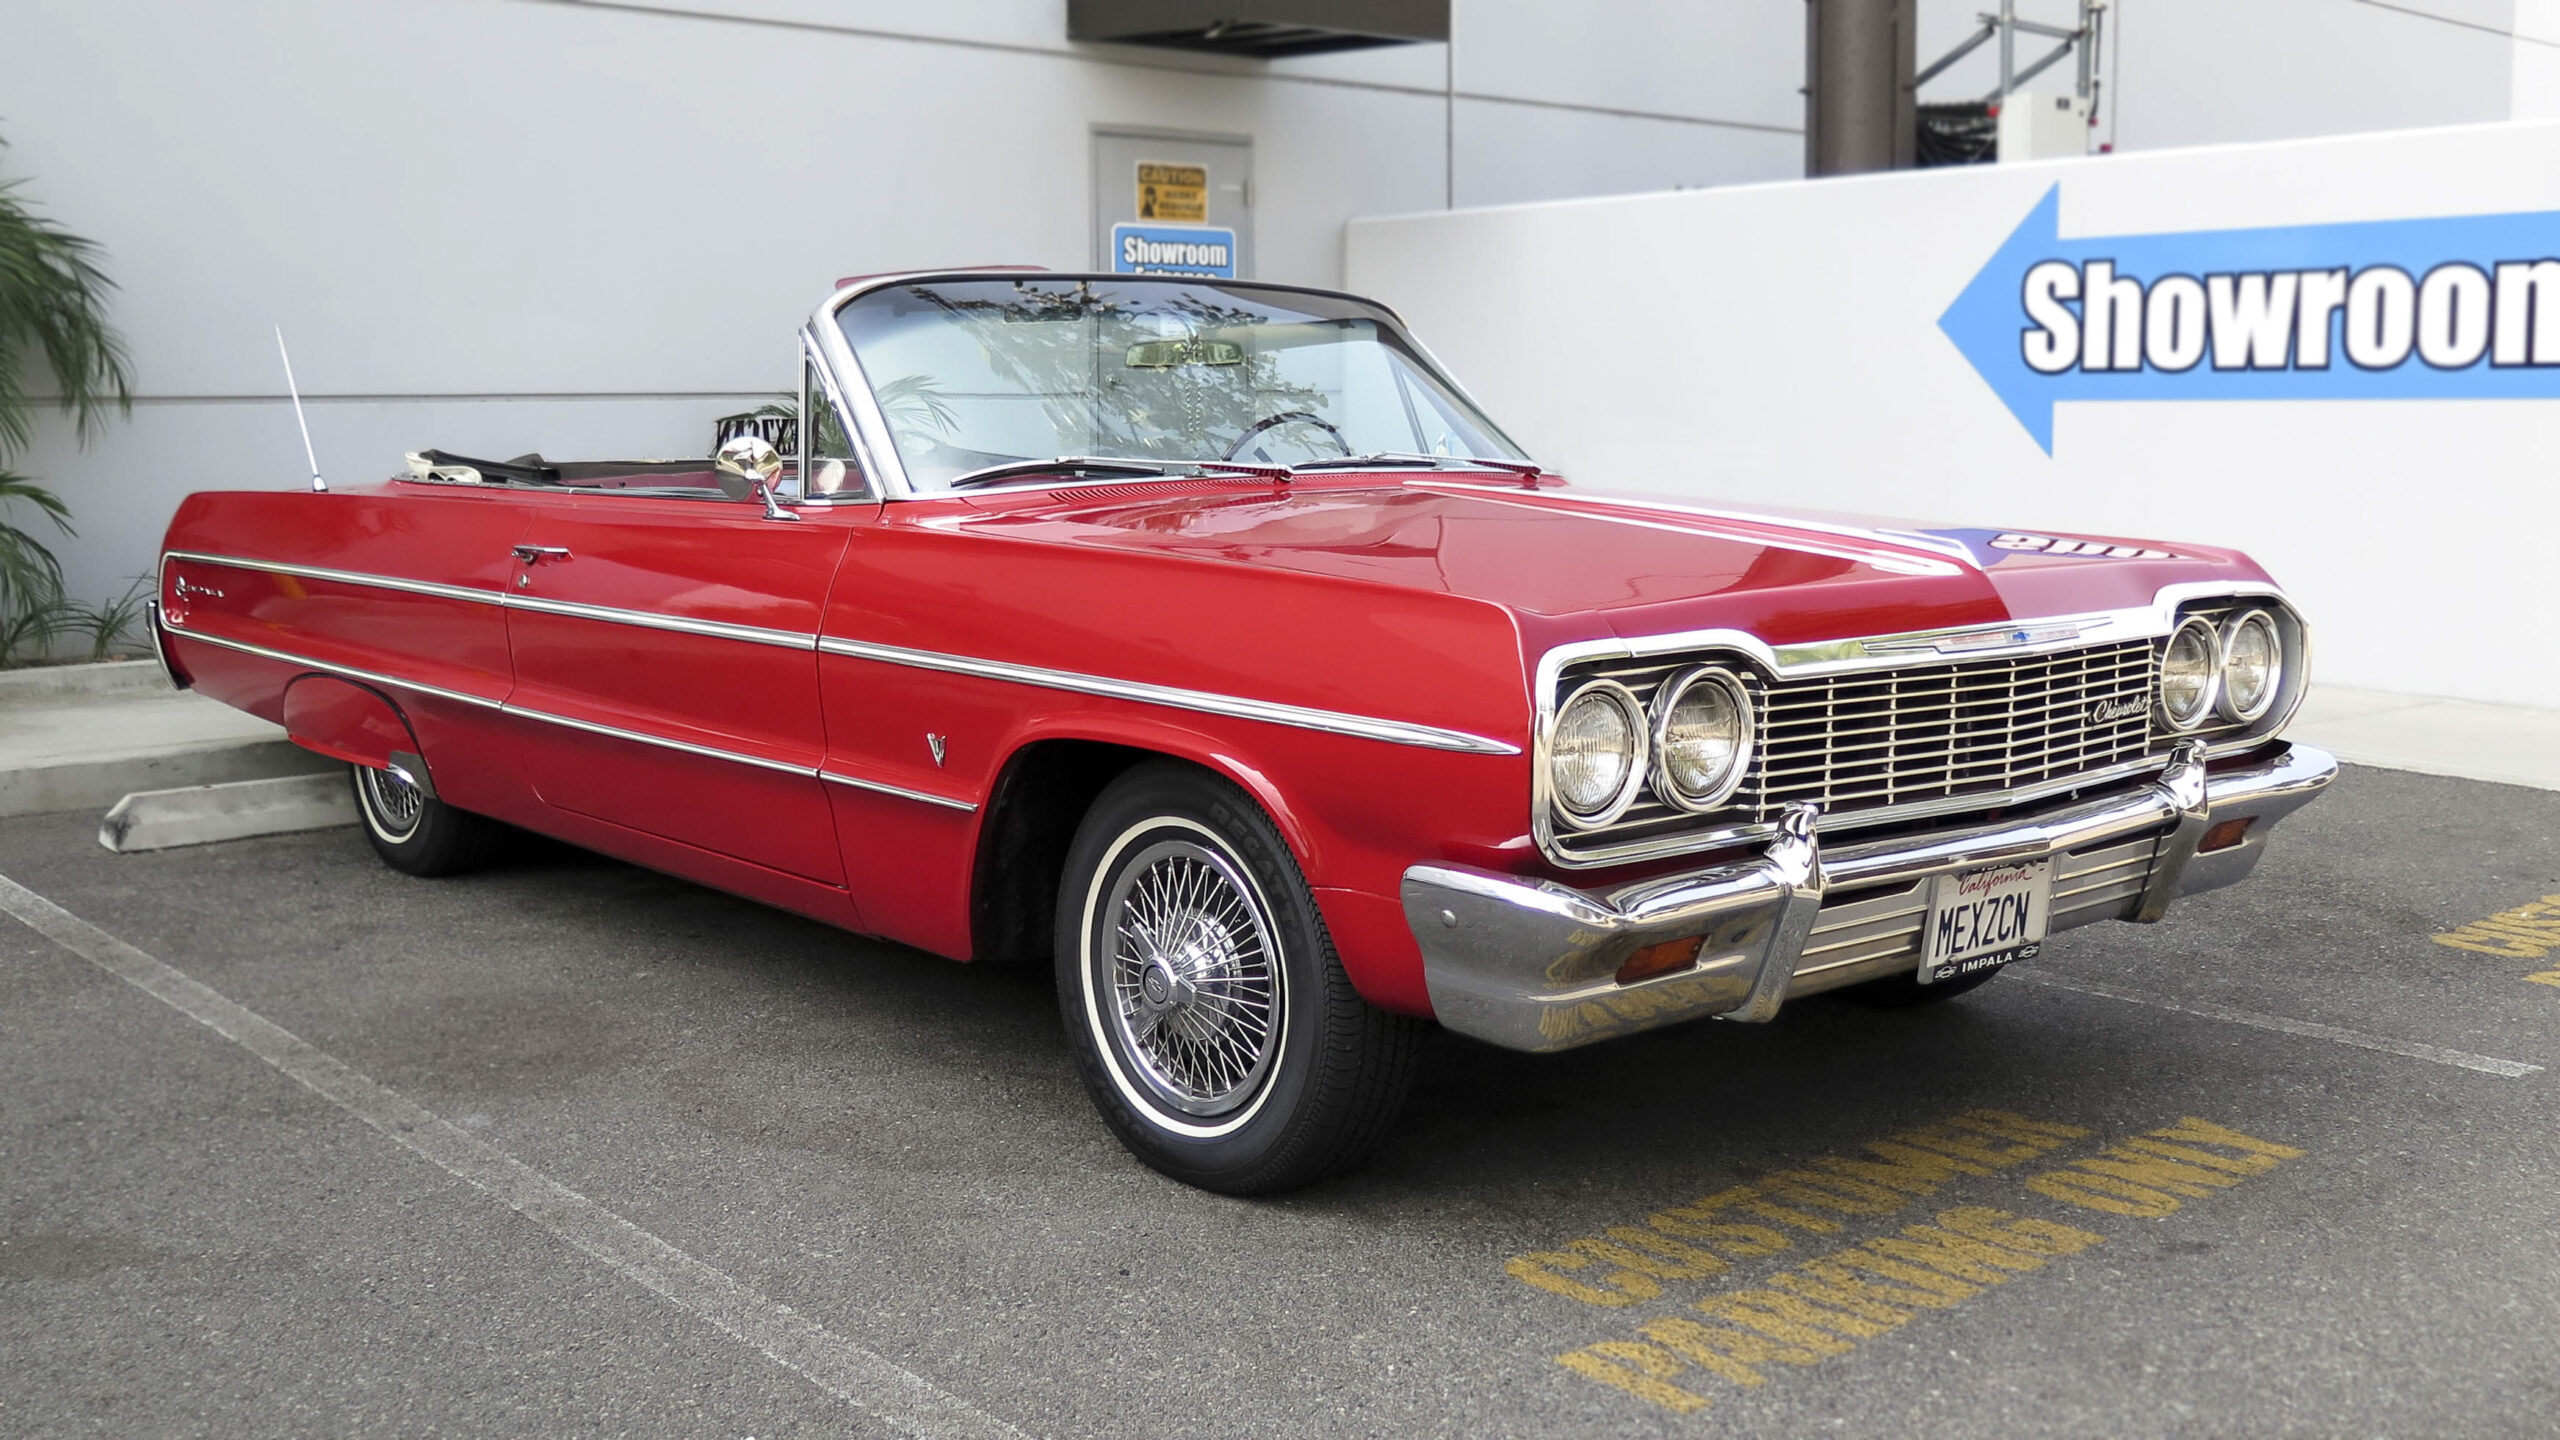 Original 1964 Impala convertible cruise by CPP